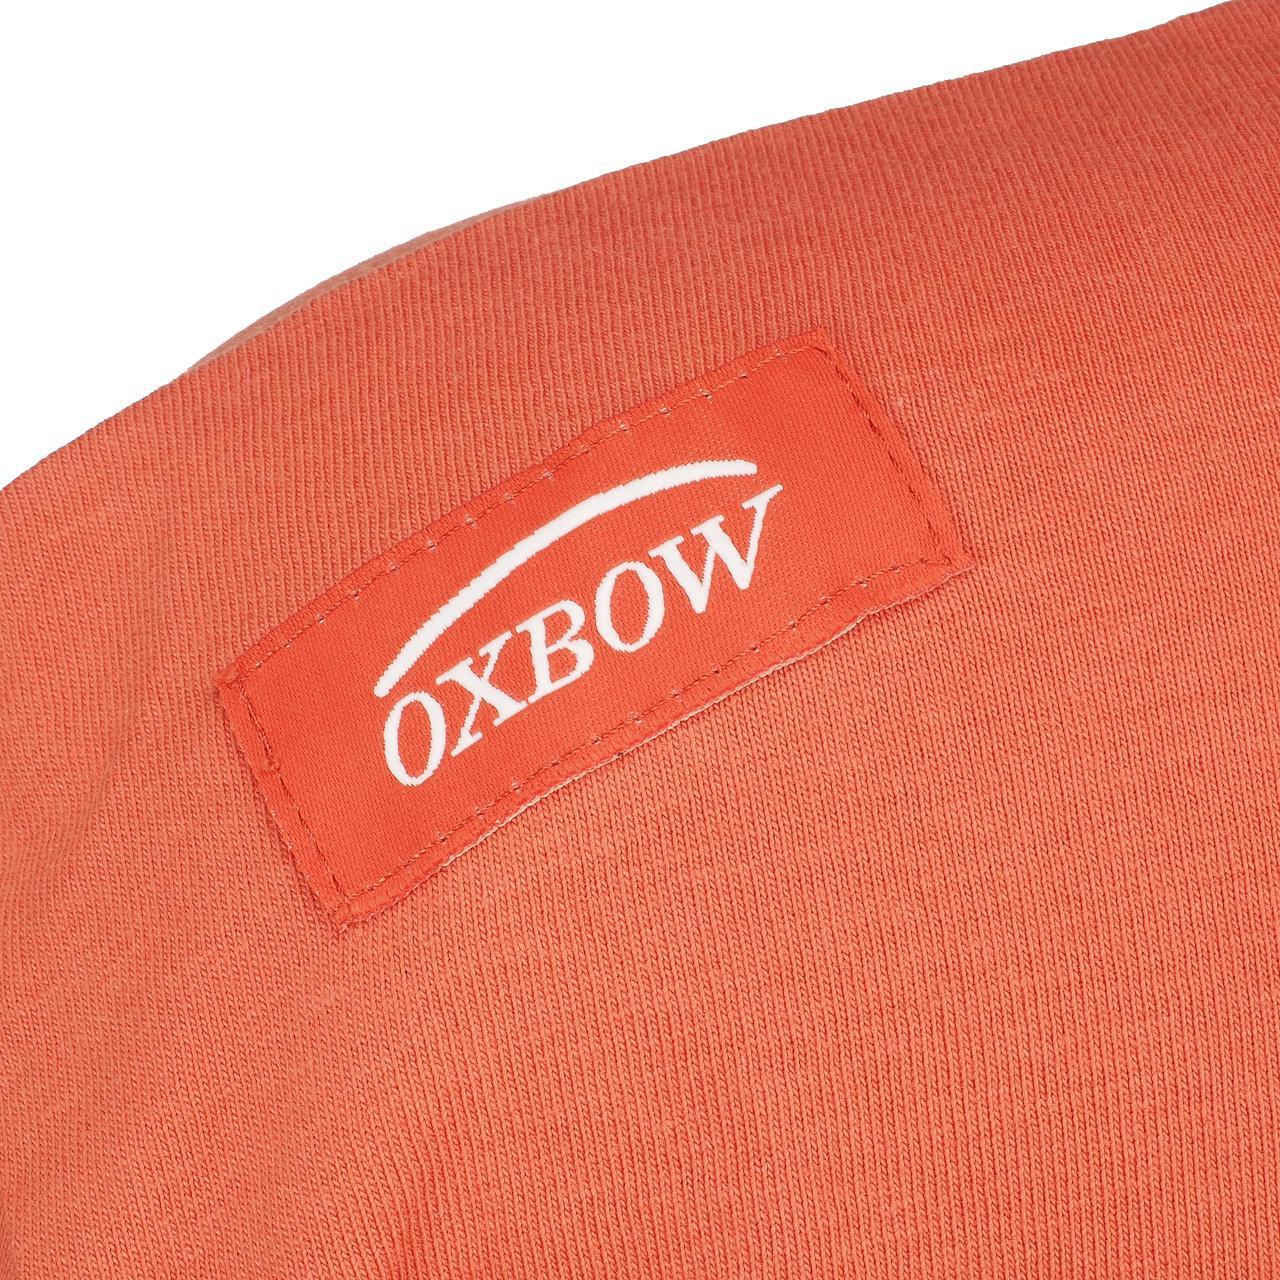 Short-Sleeve-T-Shirt-Oxbow-Taynur-Terra-Oxbow-Pink-47165-New thumbnail 4